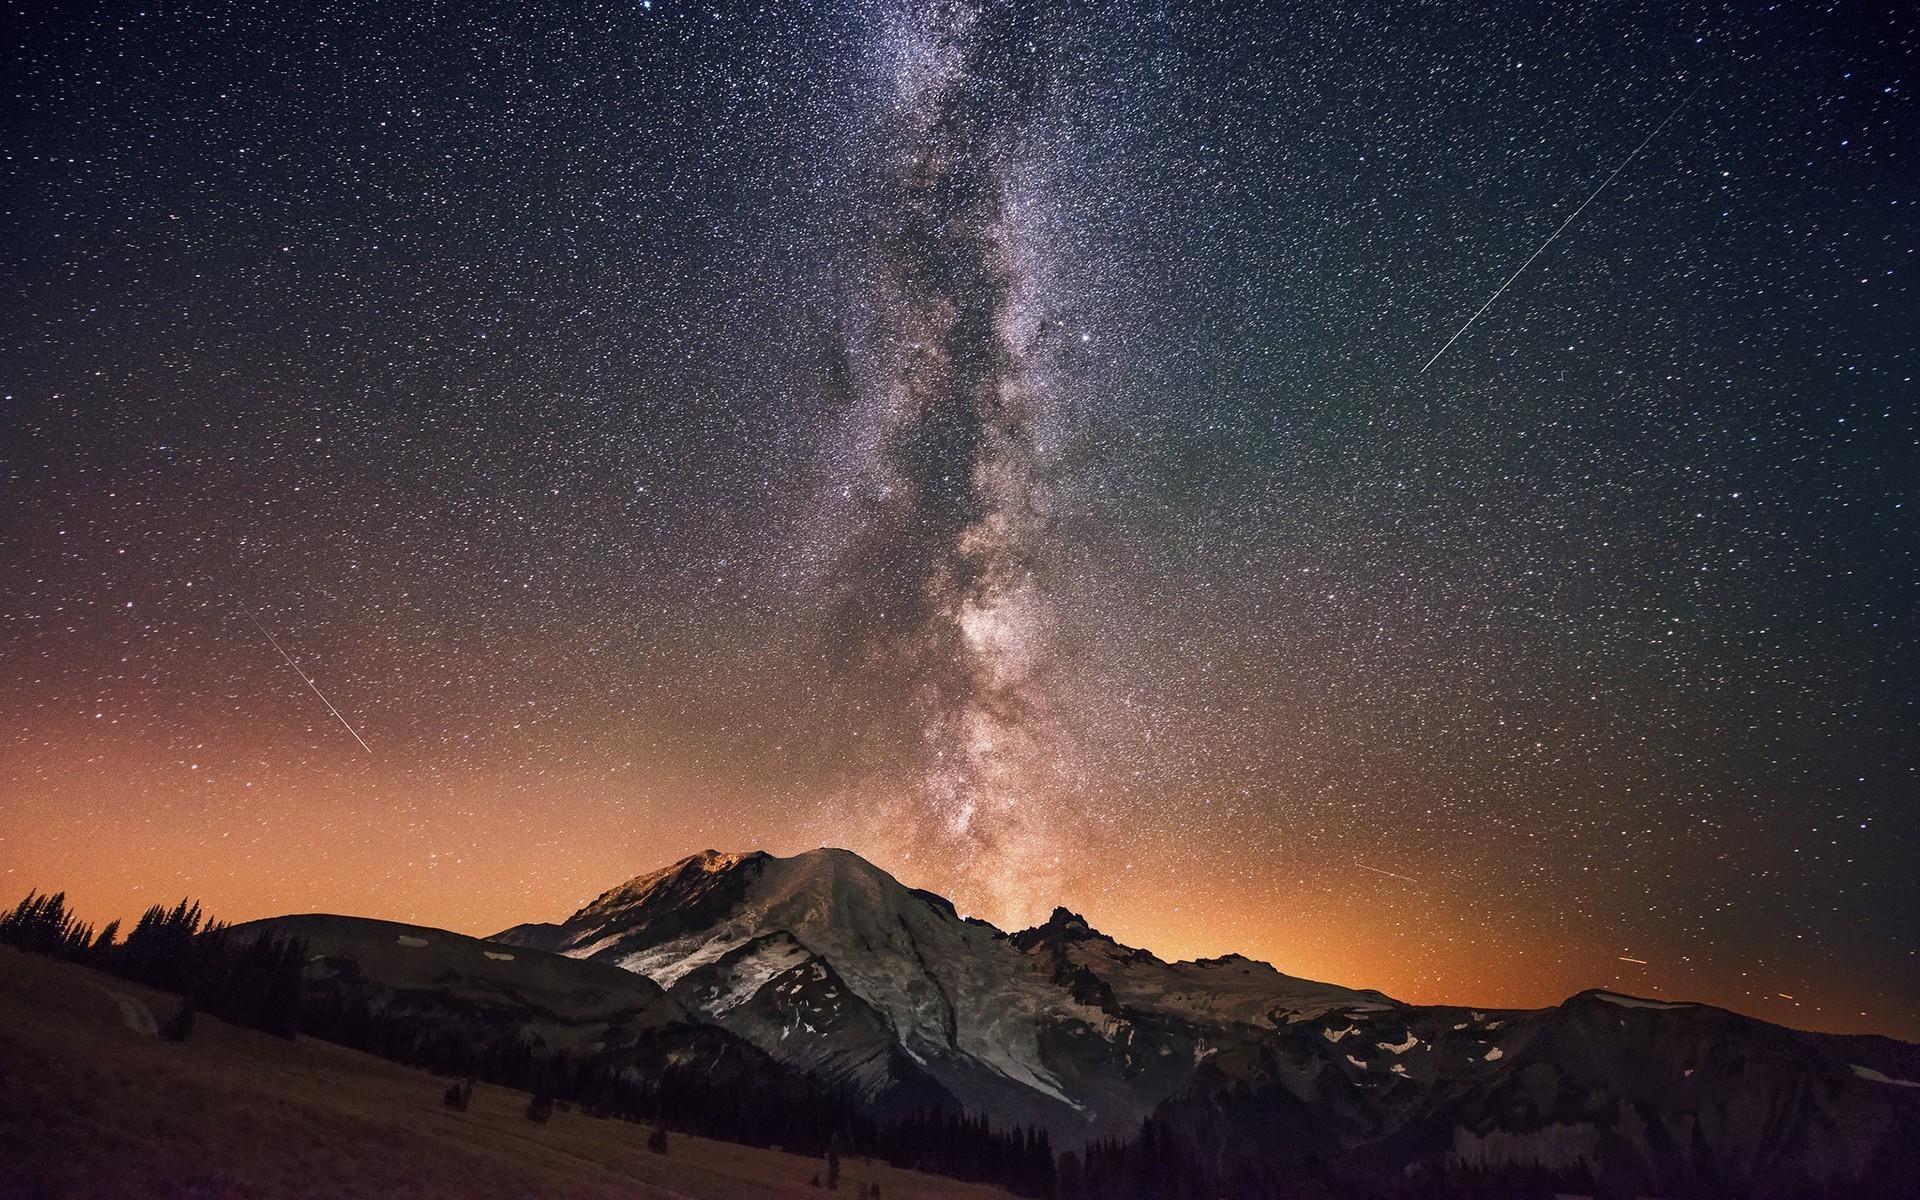 Milky Way Wallpapers – Full HD wallpaper search